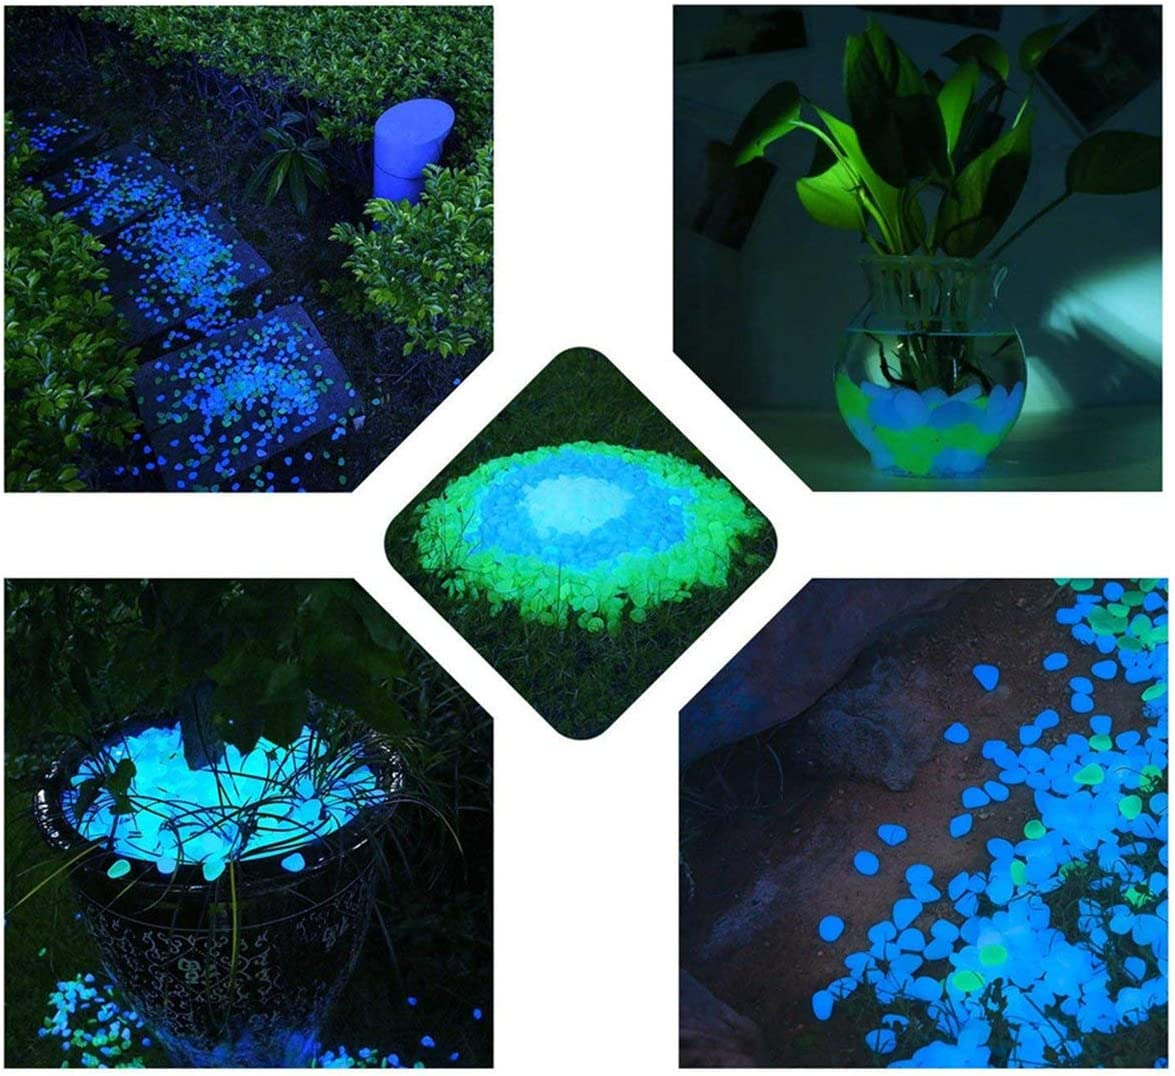 Details about  /Garden Pebbles Glow Stones Rocks for Walkways Garden PathWhite30pcs GZ